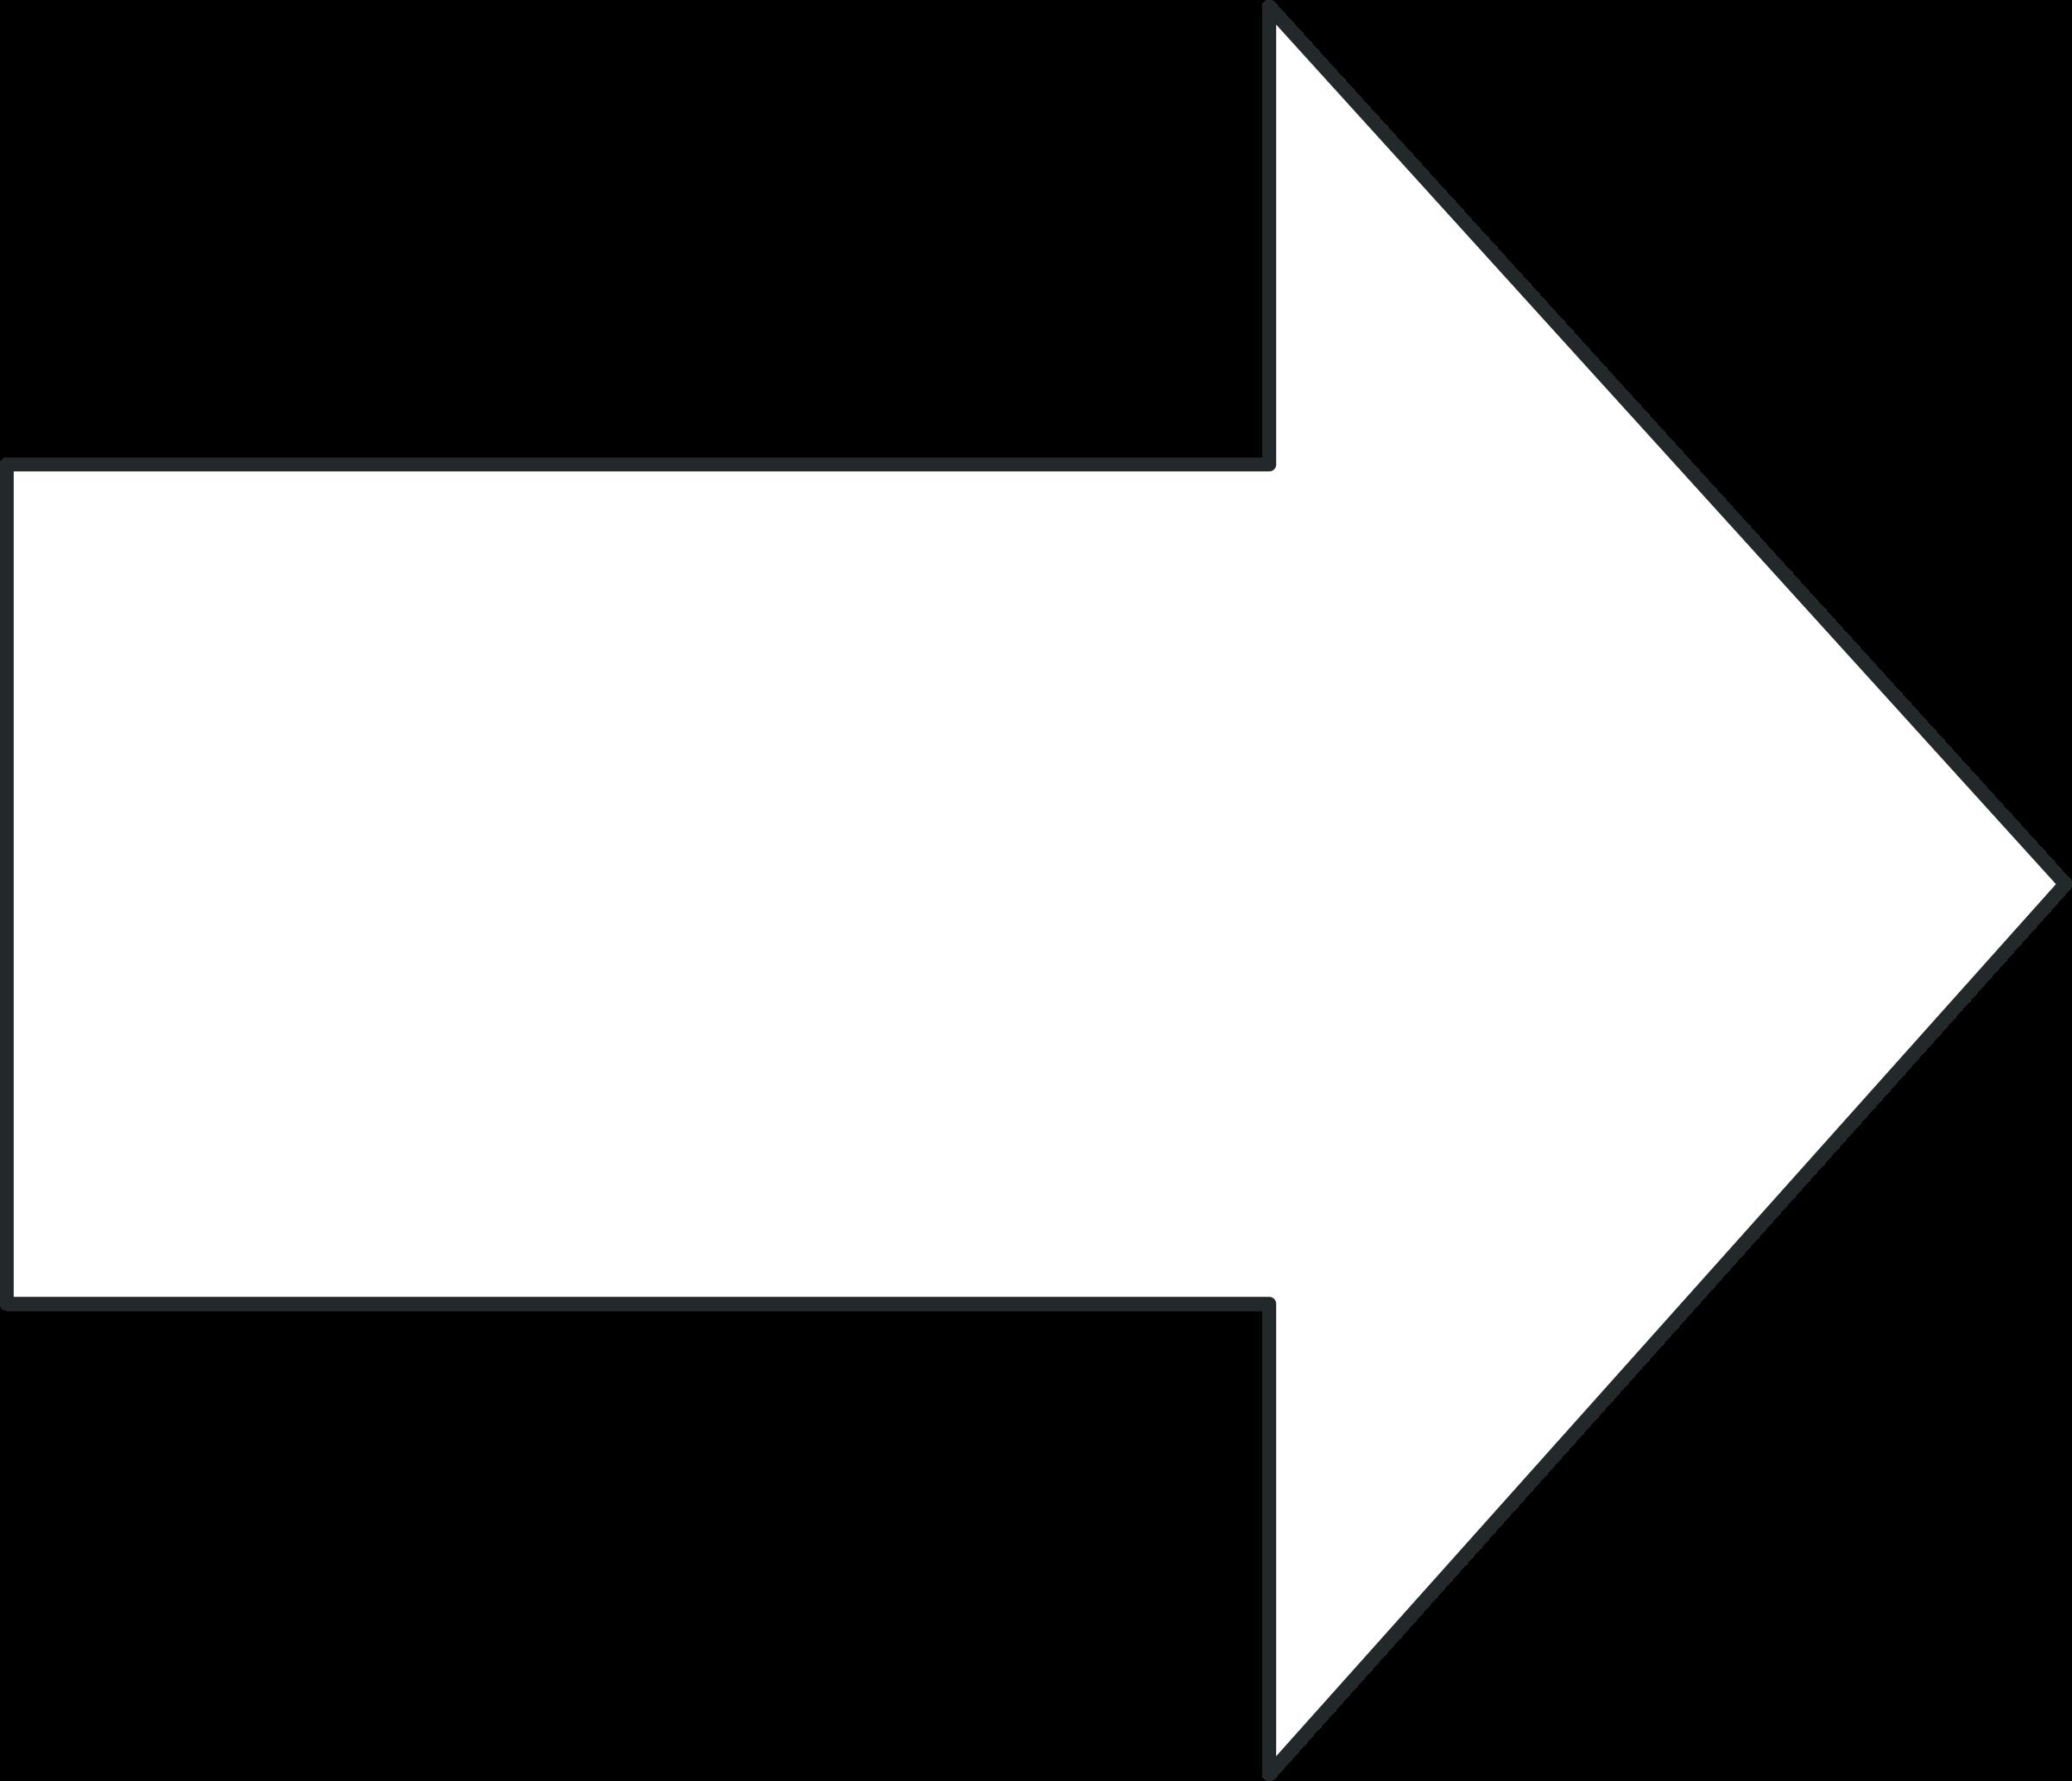 clipart arrow outline - photo #10